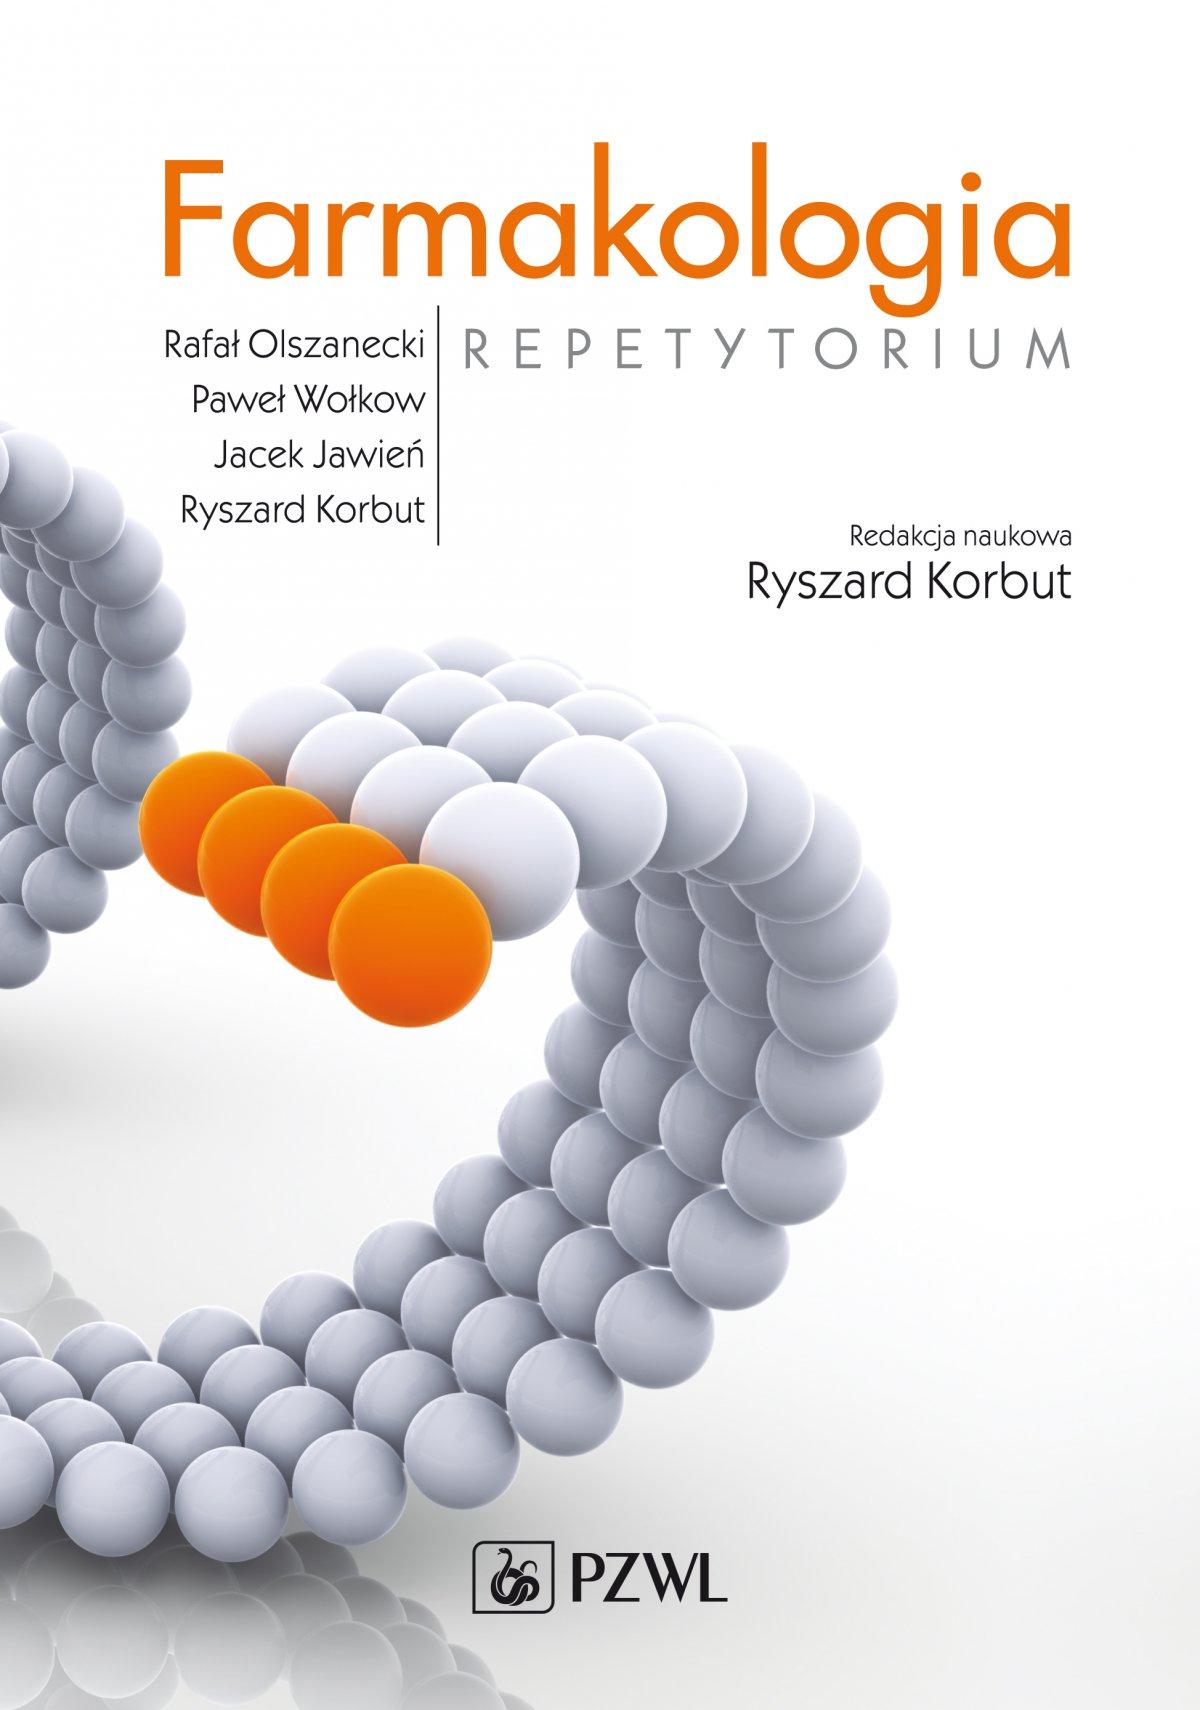 Farmakologia. Repetytorium - Ebook (Książka na Kindle) do pobrania w formacie MOBI